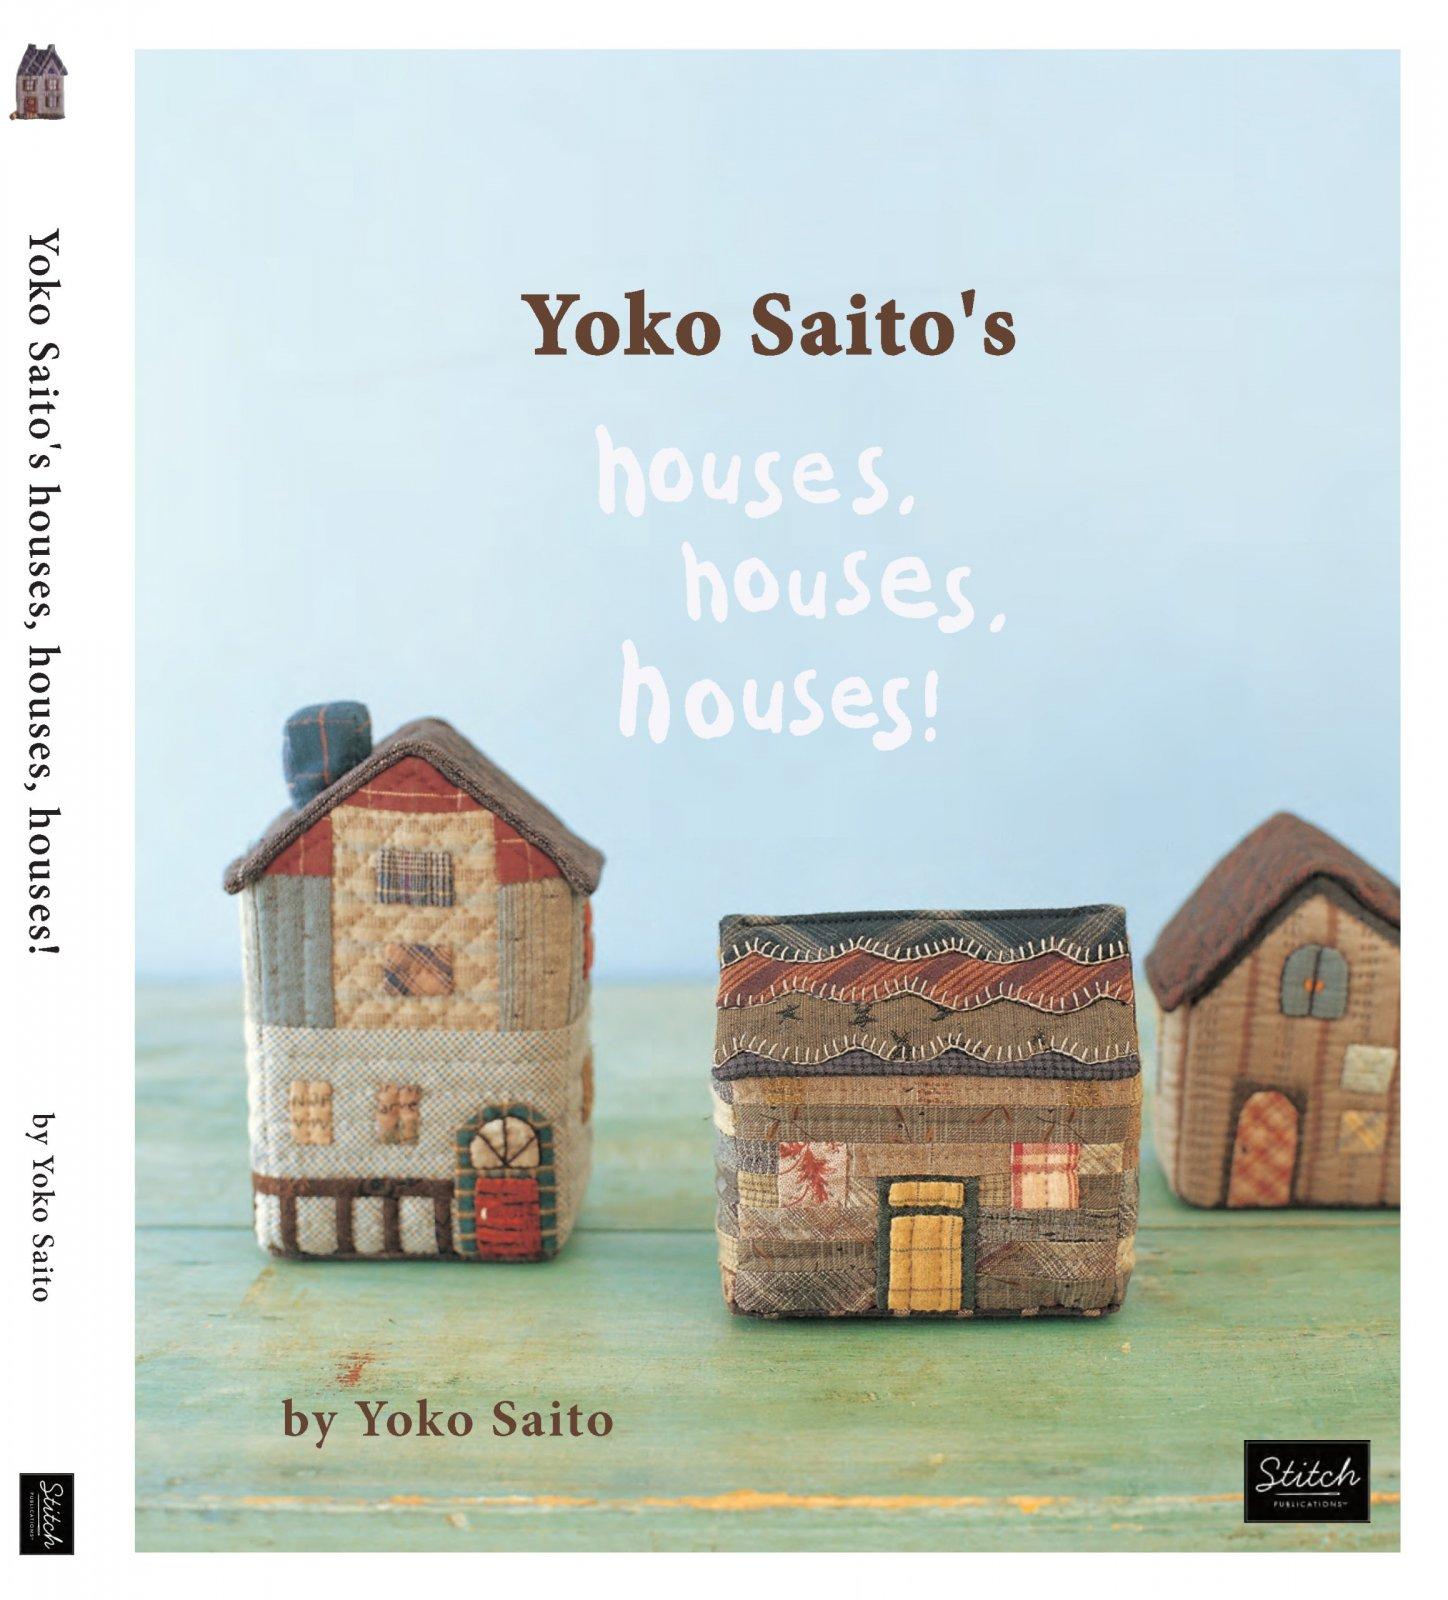 Yoko Saito Book:  Houses Houses Houses - A True Country Motif